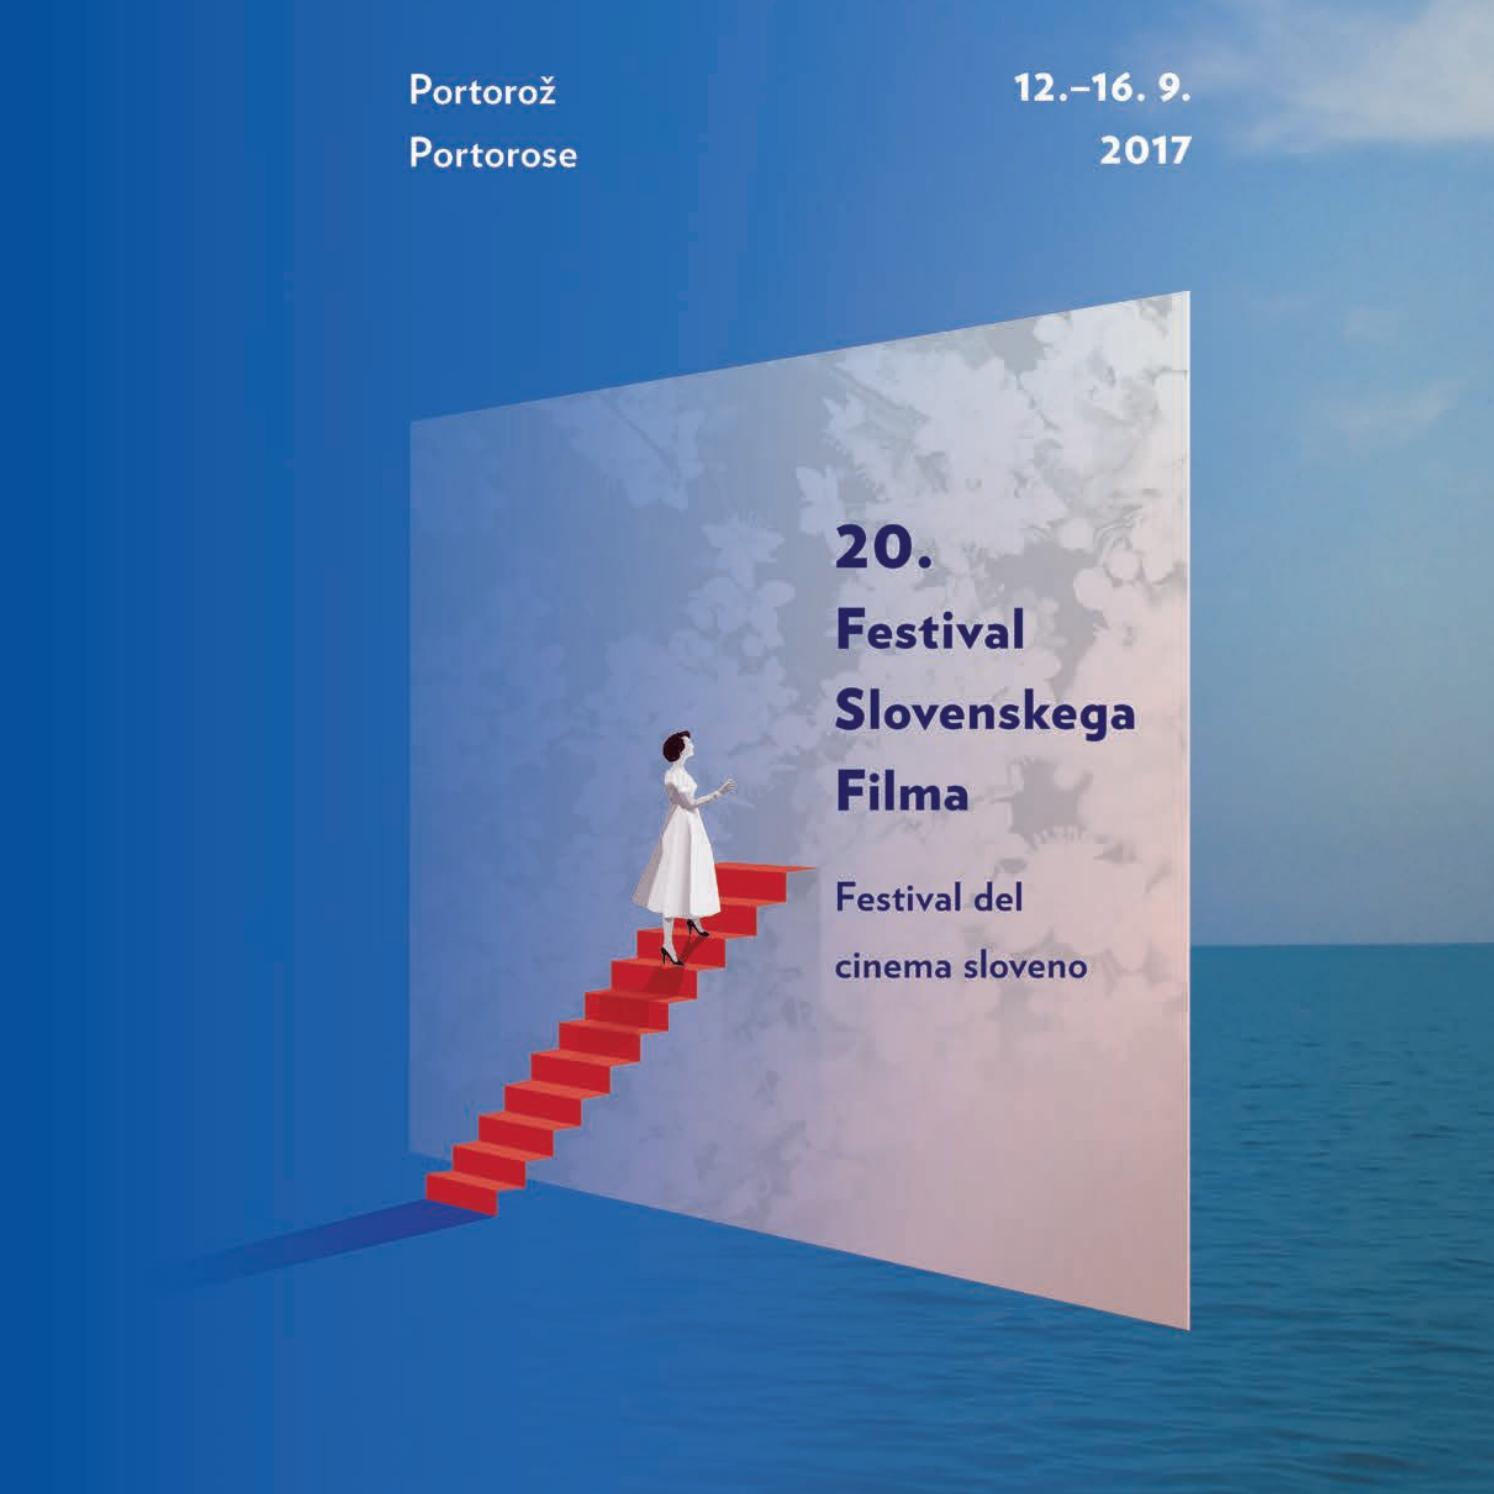 Katalog 20 Festival Slovenskega Filma By Slovenian Film